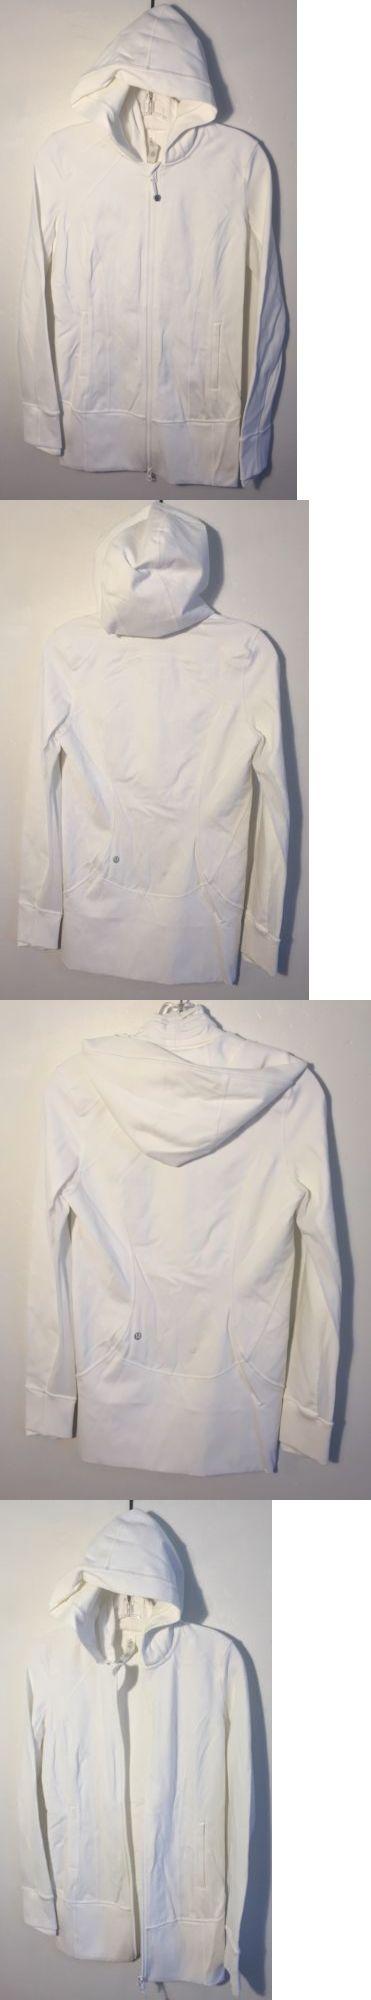 Athletic Apparel 137085: Lululemon Full Zip Hooded Athletic Yoga Jacket White New Women S Size 6 Nwot -> BUY IT NOW ONLY: $74.99 on eBay!